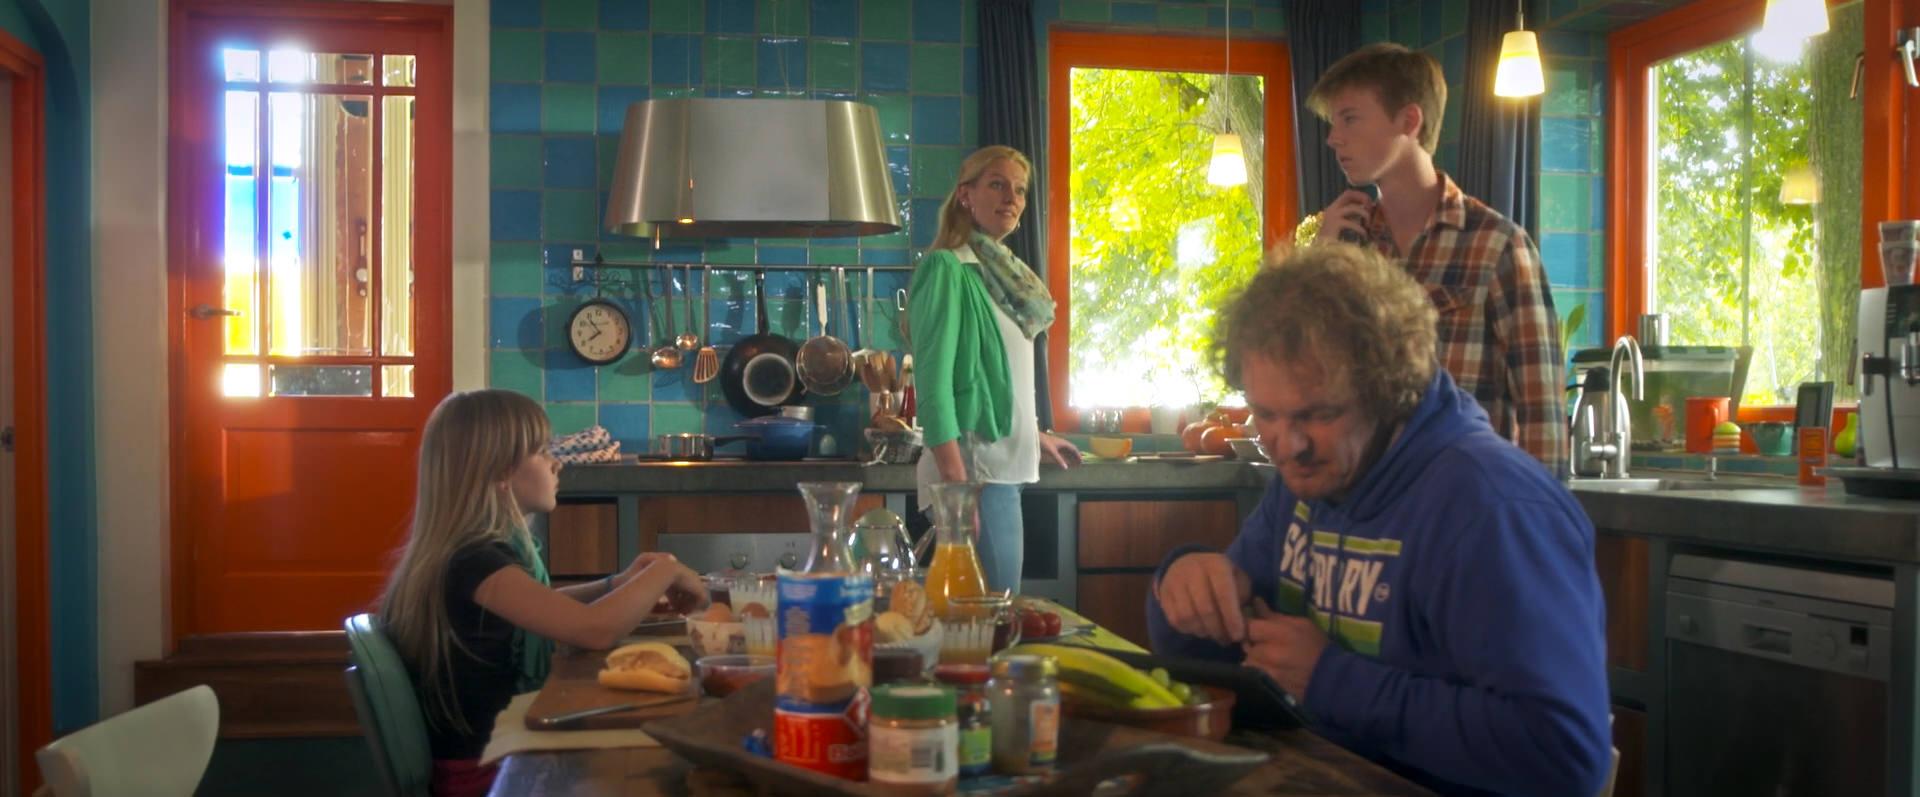 "Filmstill uit ""D.E.A.L. de Pilot"" met Aiko Beemsterboer, Cecile Clappers, Stijn Karssies en Drewes Wildeman."